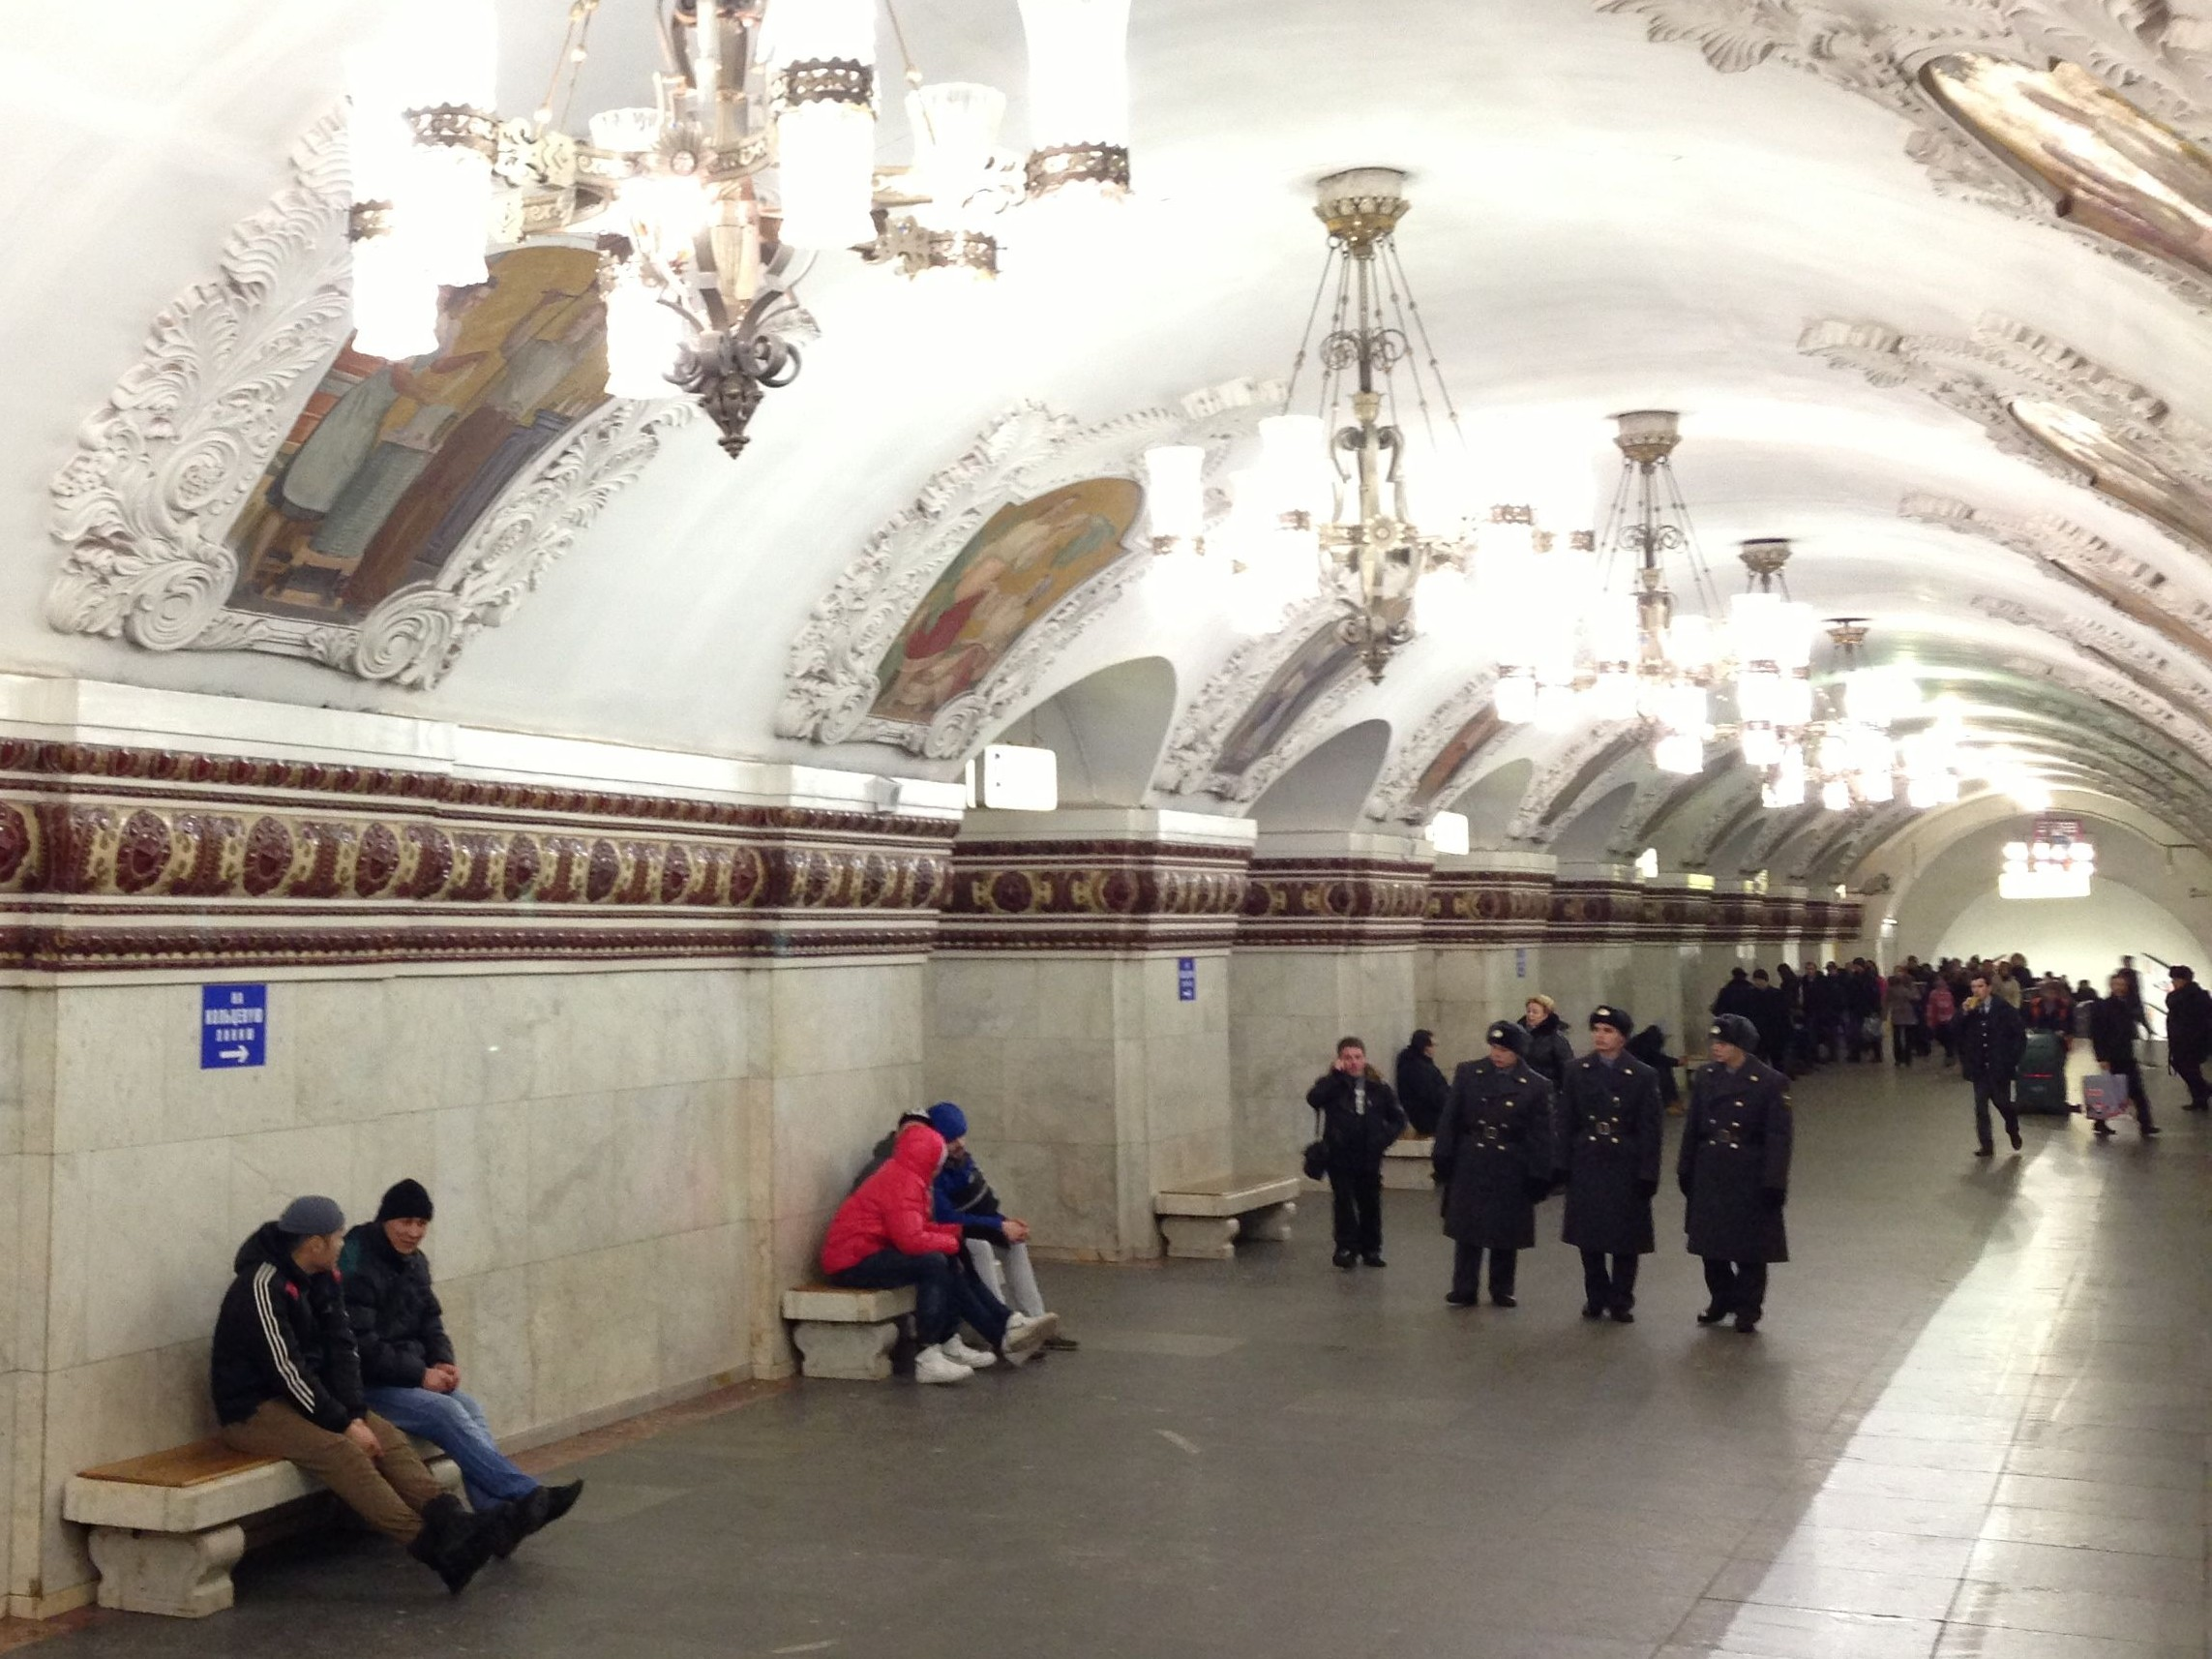 Prachtig metrostation in Moskou